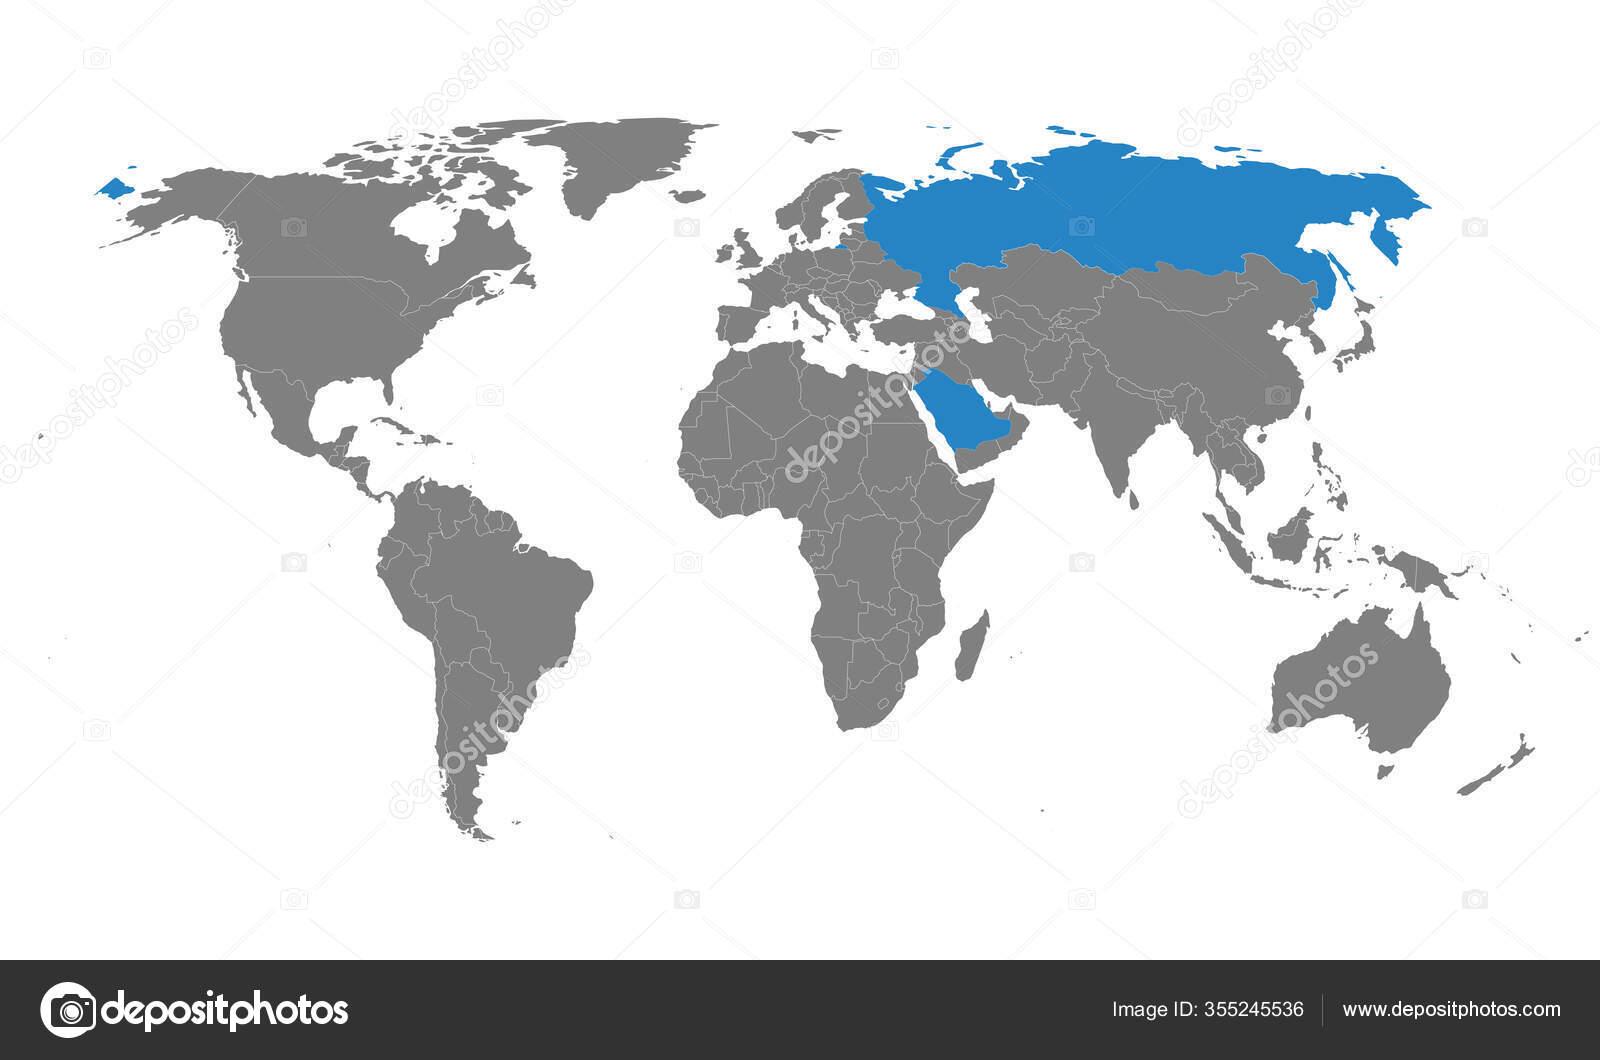 Saudi Arabia Usa Countries Highlighted World Map Gray Background Perfect Stock Vector C Rasik Niceguy Gmail Com 355245536